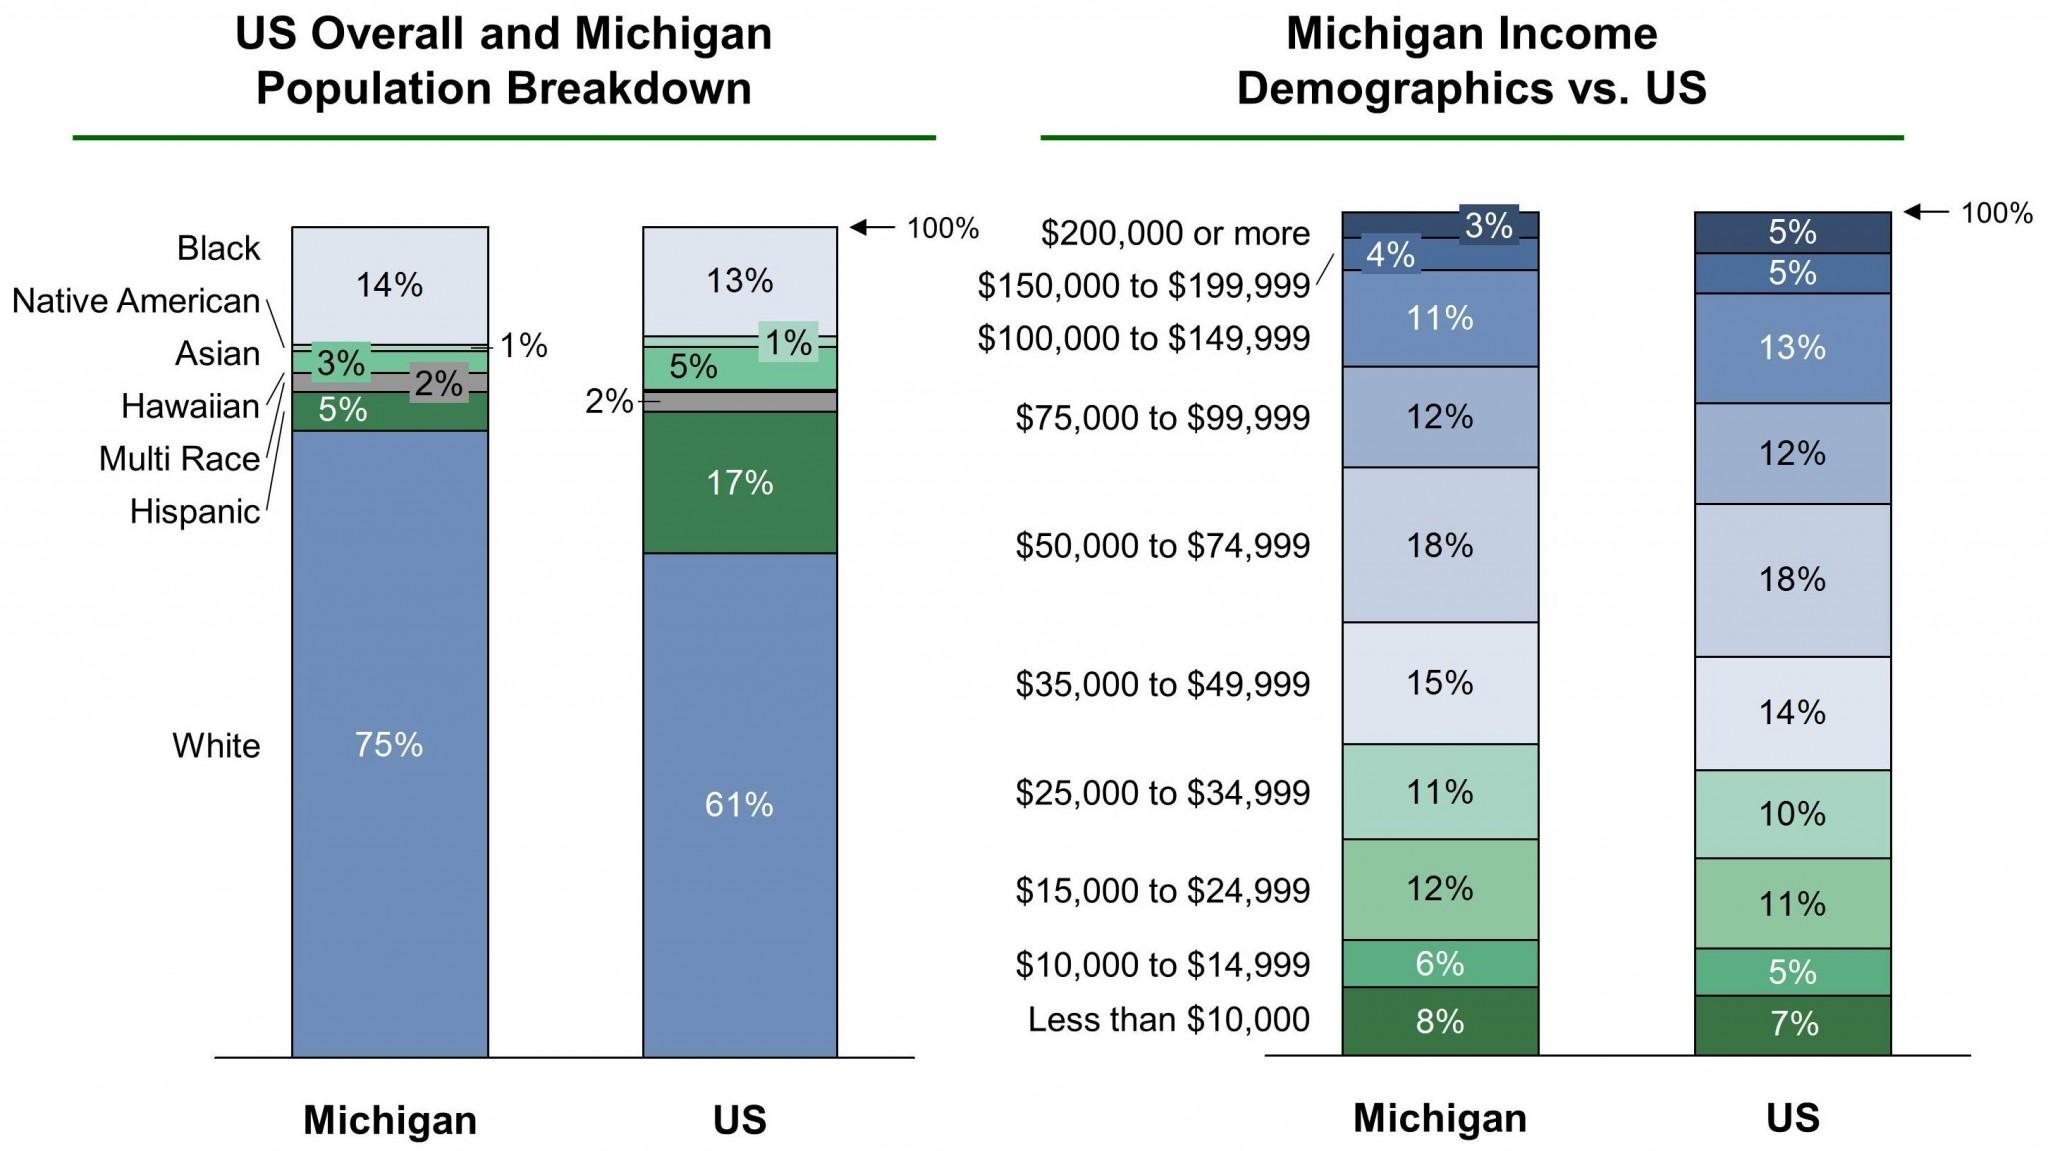 Michigan EB-5 Regional Center Demographics VF